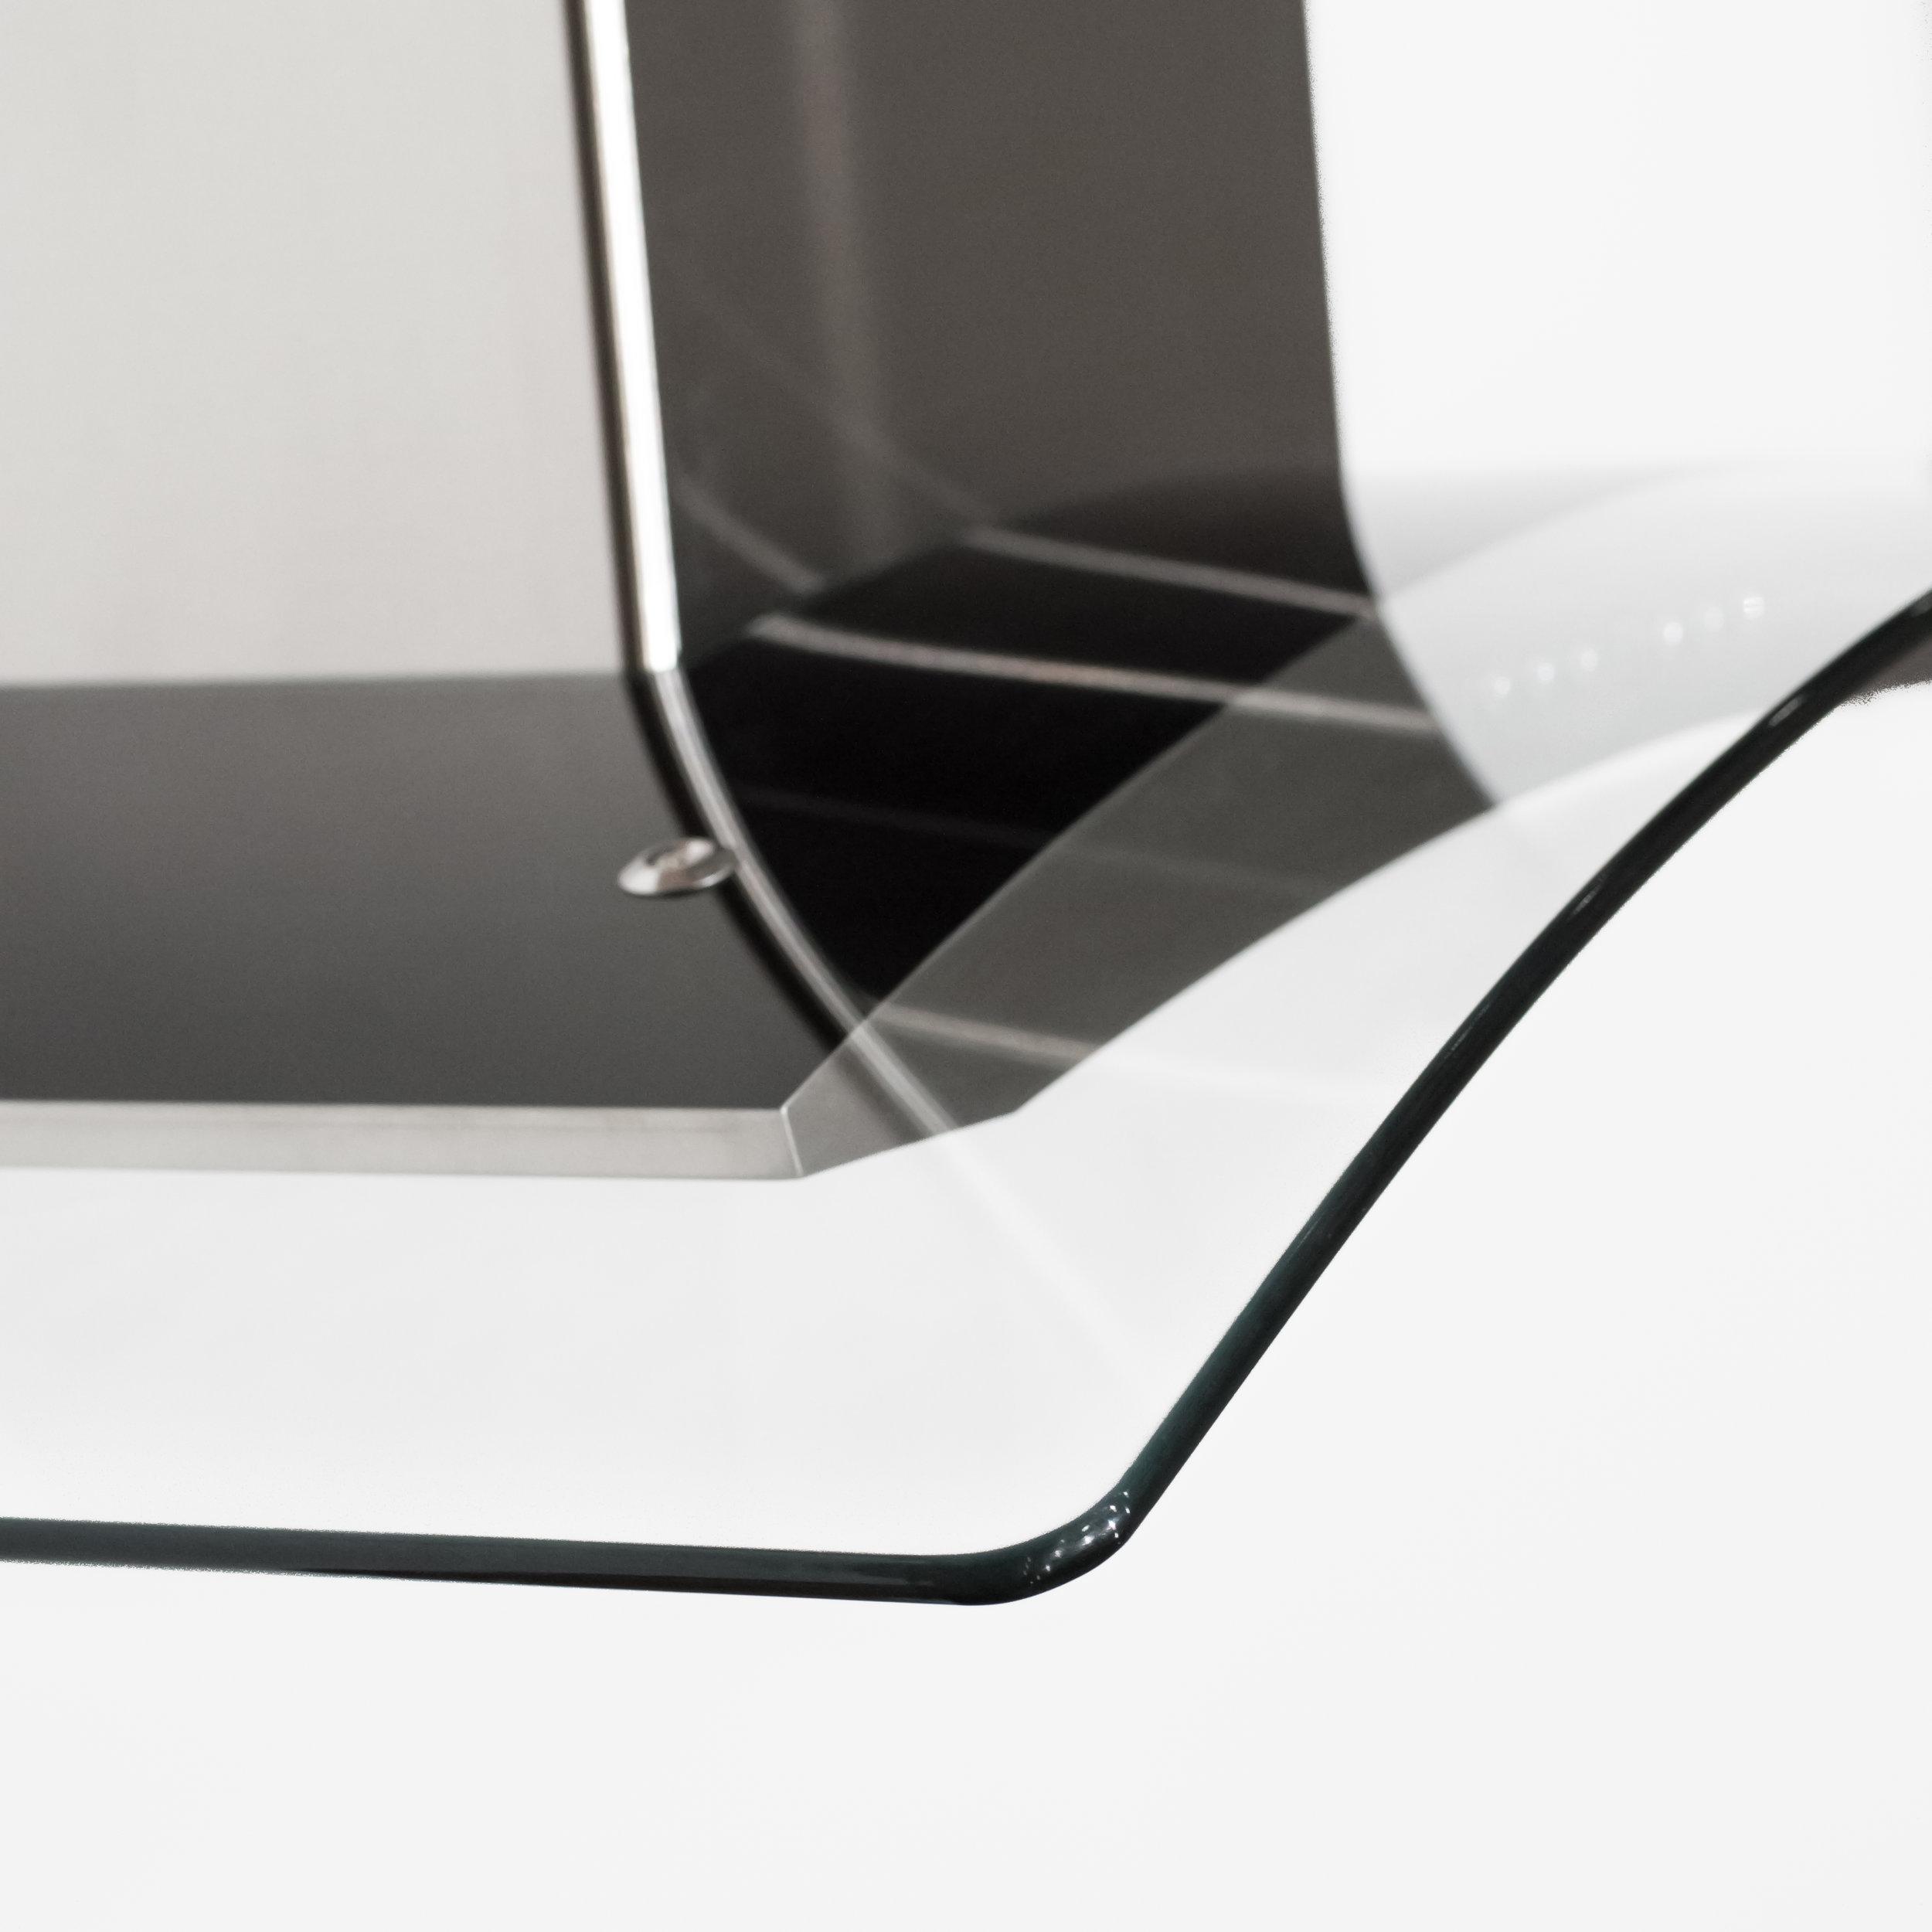 zline-stainless-steel-wall-mounted-range-hood-KN4-glass-detail 1.jpg